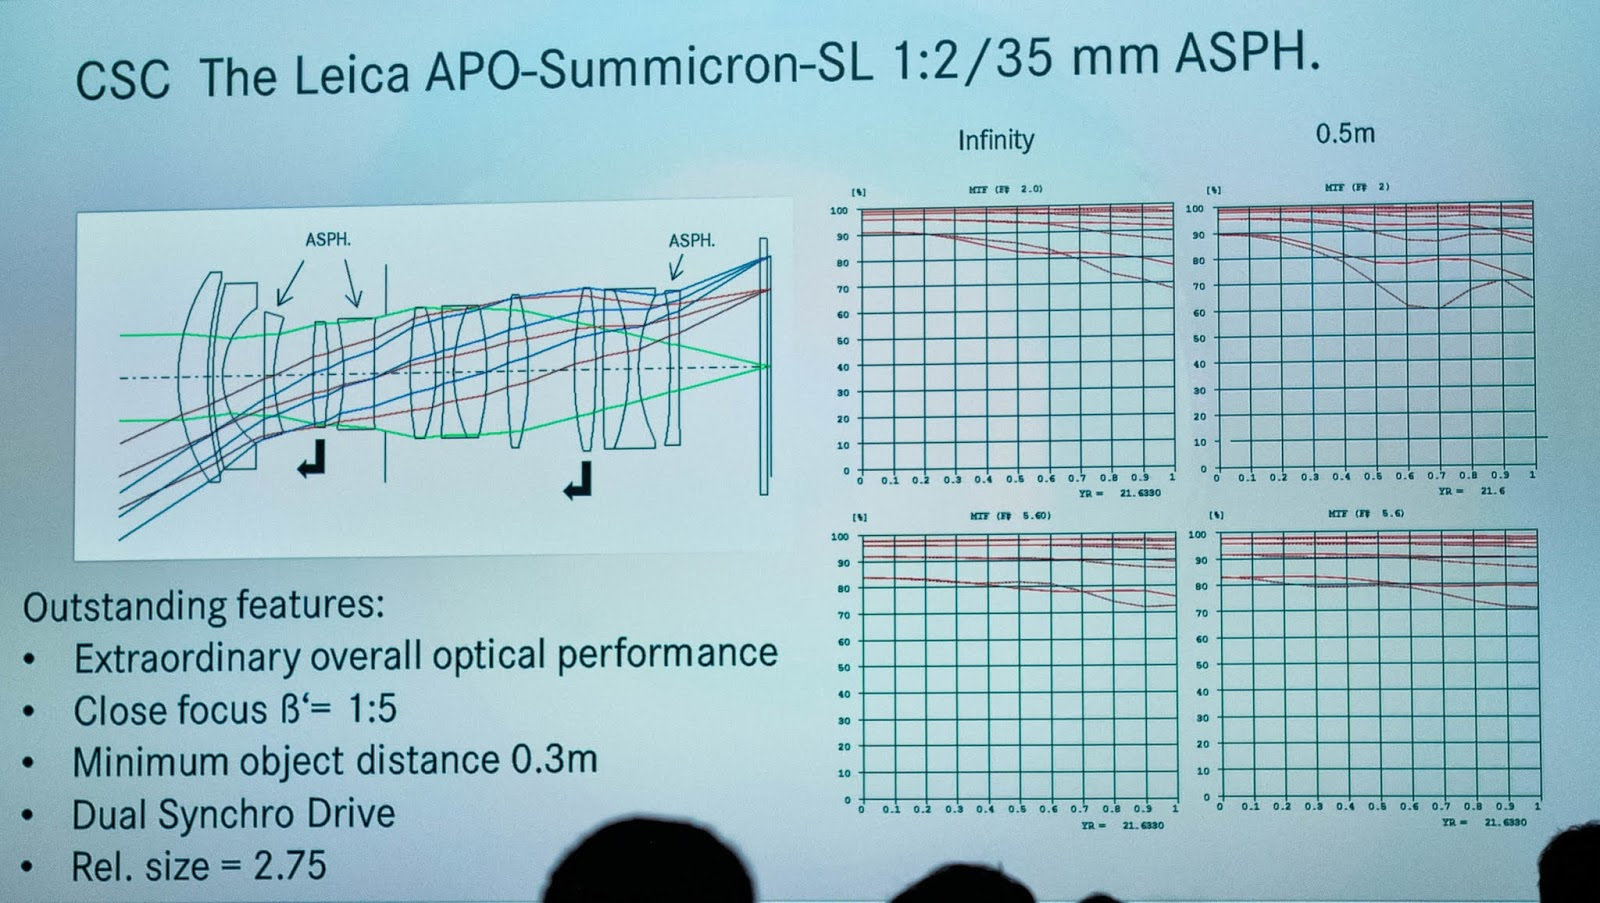 Оптическая схема и MTF-график объектива Leica Summicron-SL 35mm f/2 ASPH